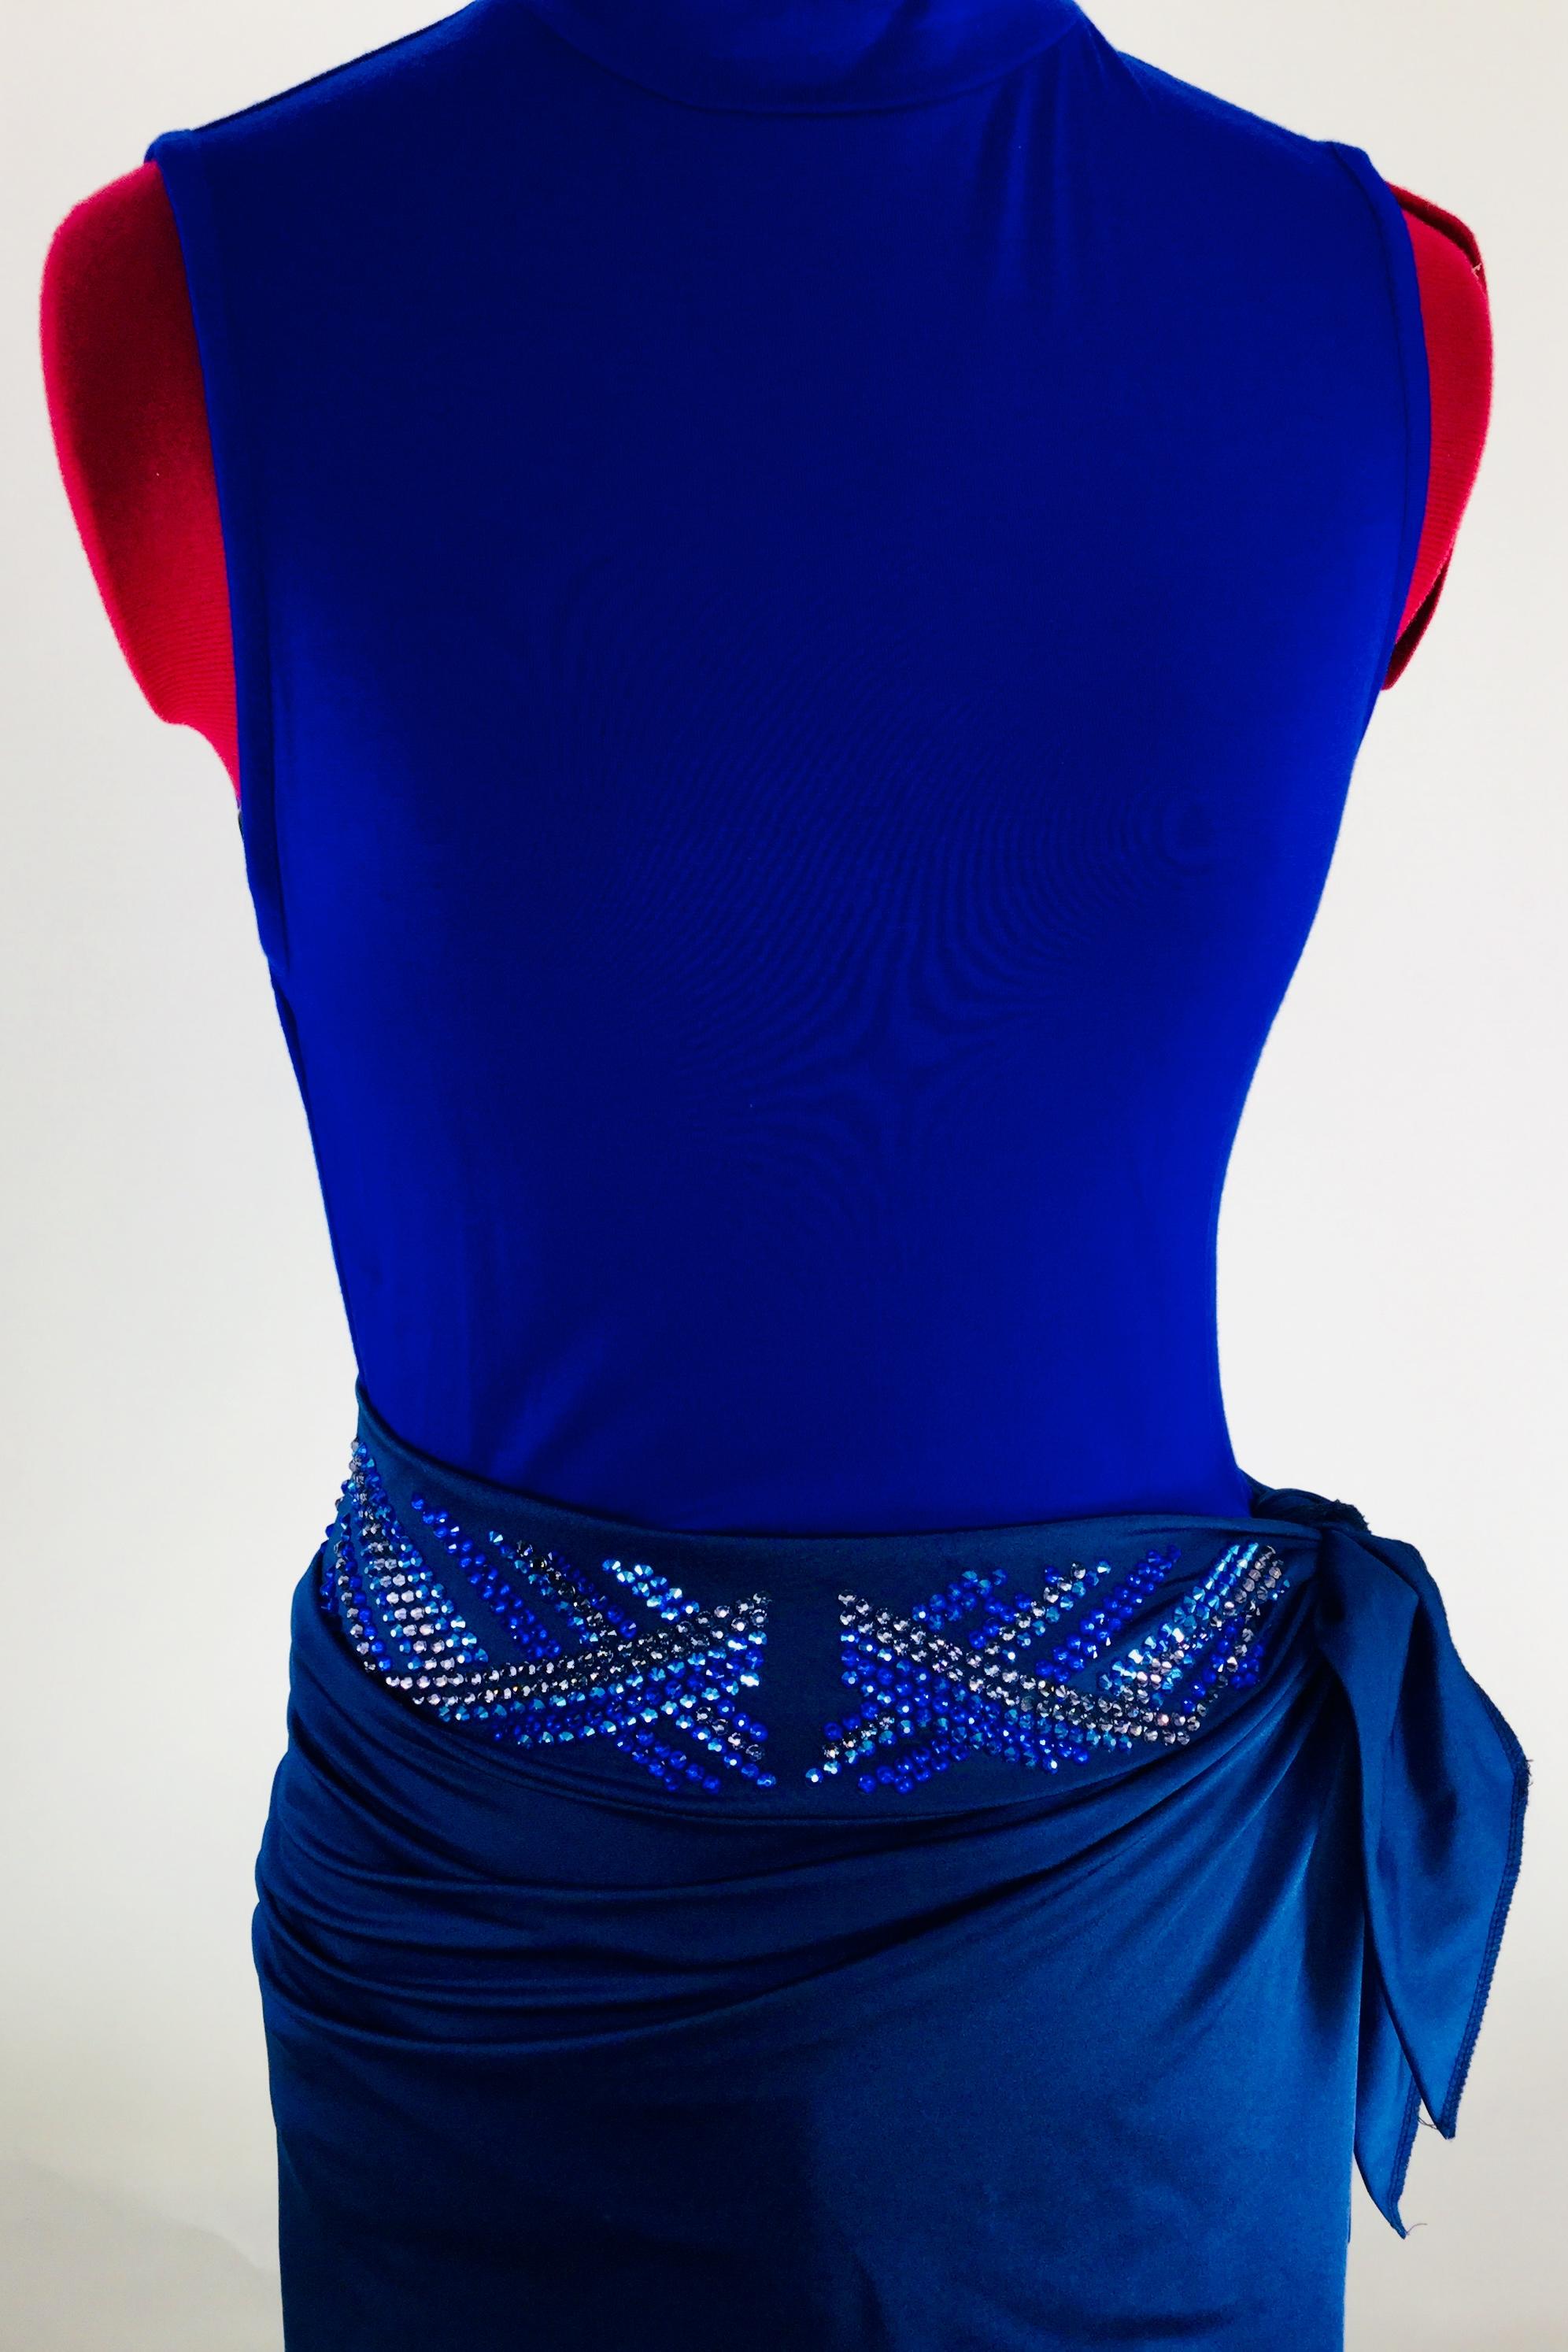 Sparkle Ridge * Rhinestonewear * Beautiful in Blue * Skirt Wrap